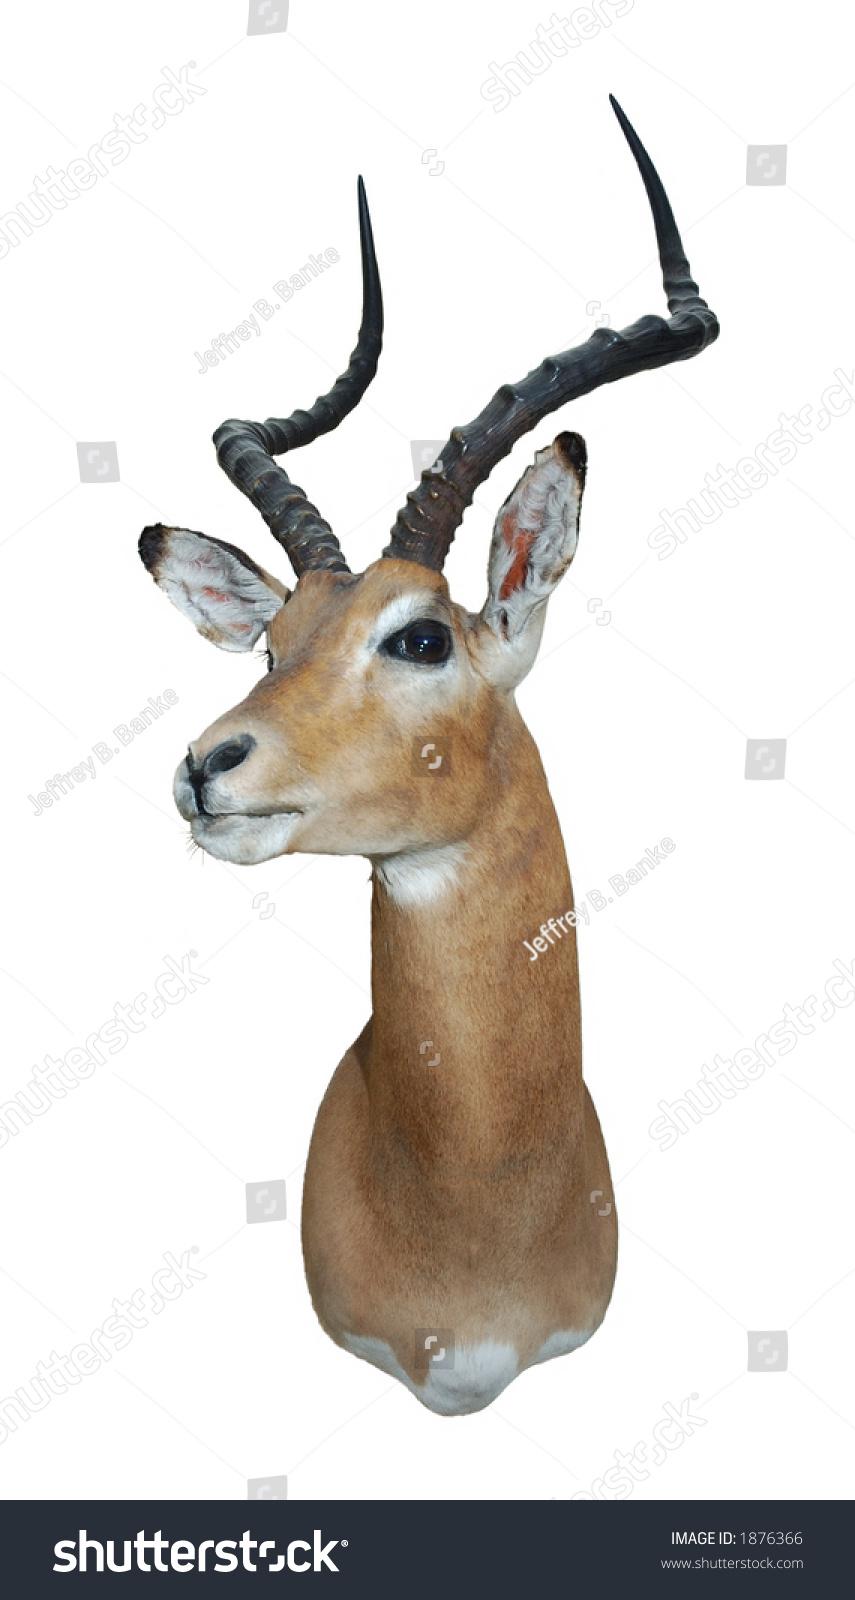 impala african antelope mount over a white background. Black Bedroom Furniture Sets. Home Design Ideas